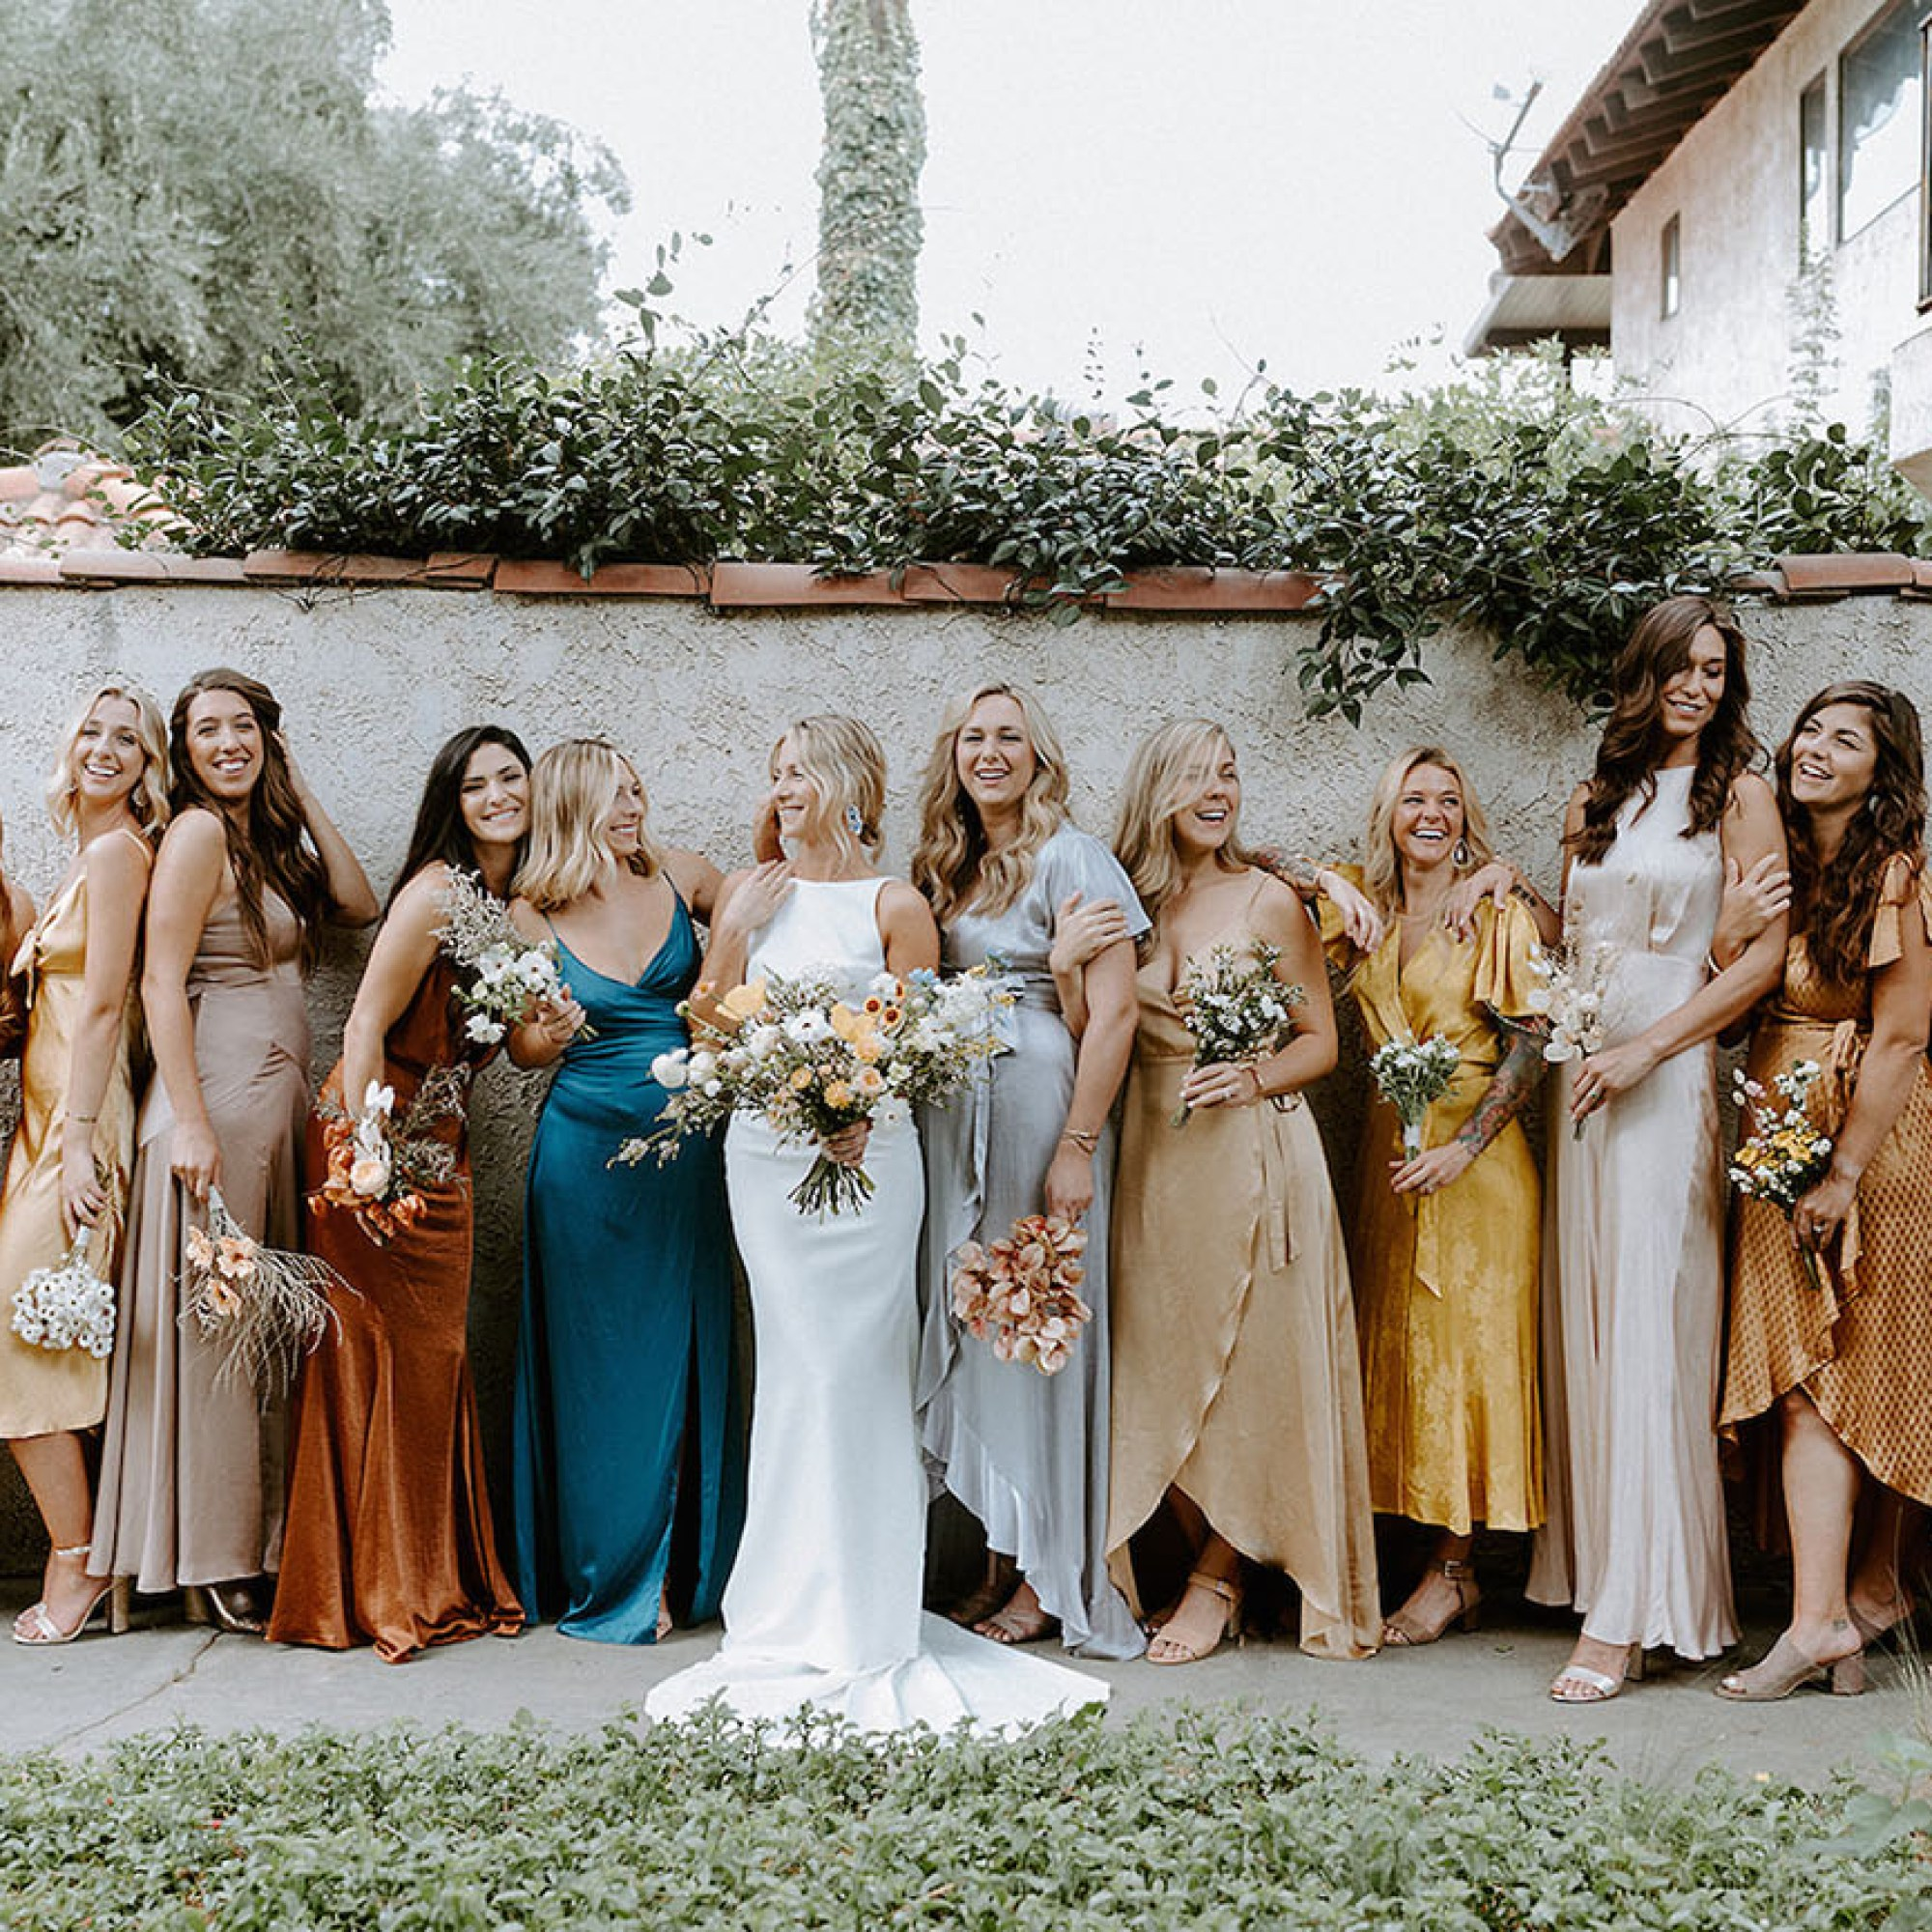 https://i0.wp.com/greenweddingshoes.com/wp-content/uploads/2020/02/sarahloic-wedding-01.jpg?resize=2000%2C2000